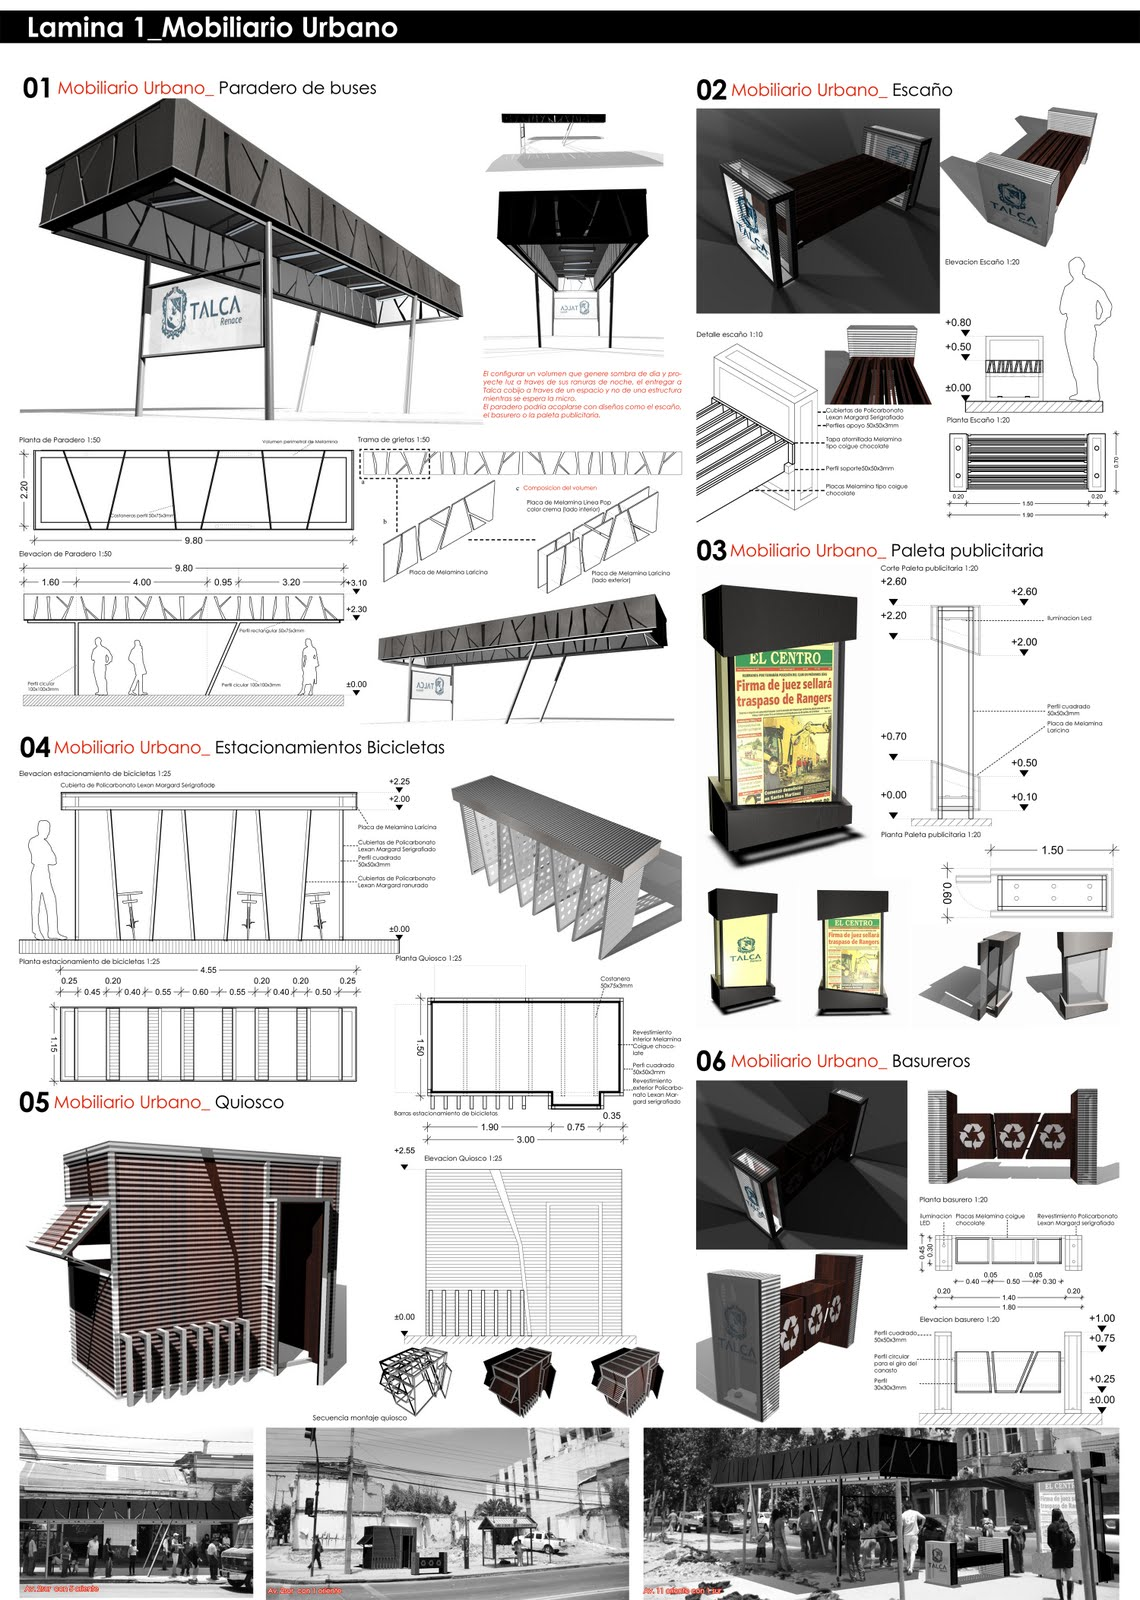 Andres rodriguez ravanal arquitecto concurso mobiliario for Equipamiento urbano arquitectura pdf